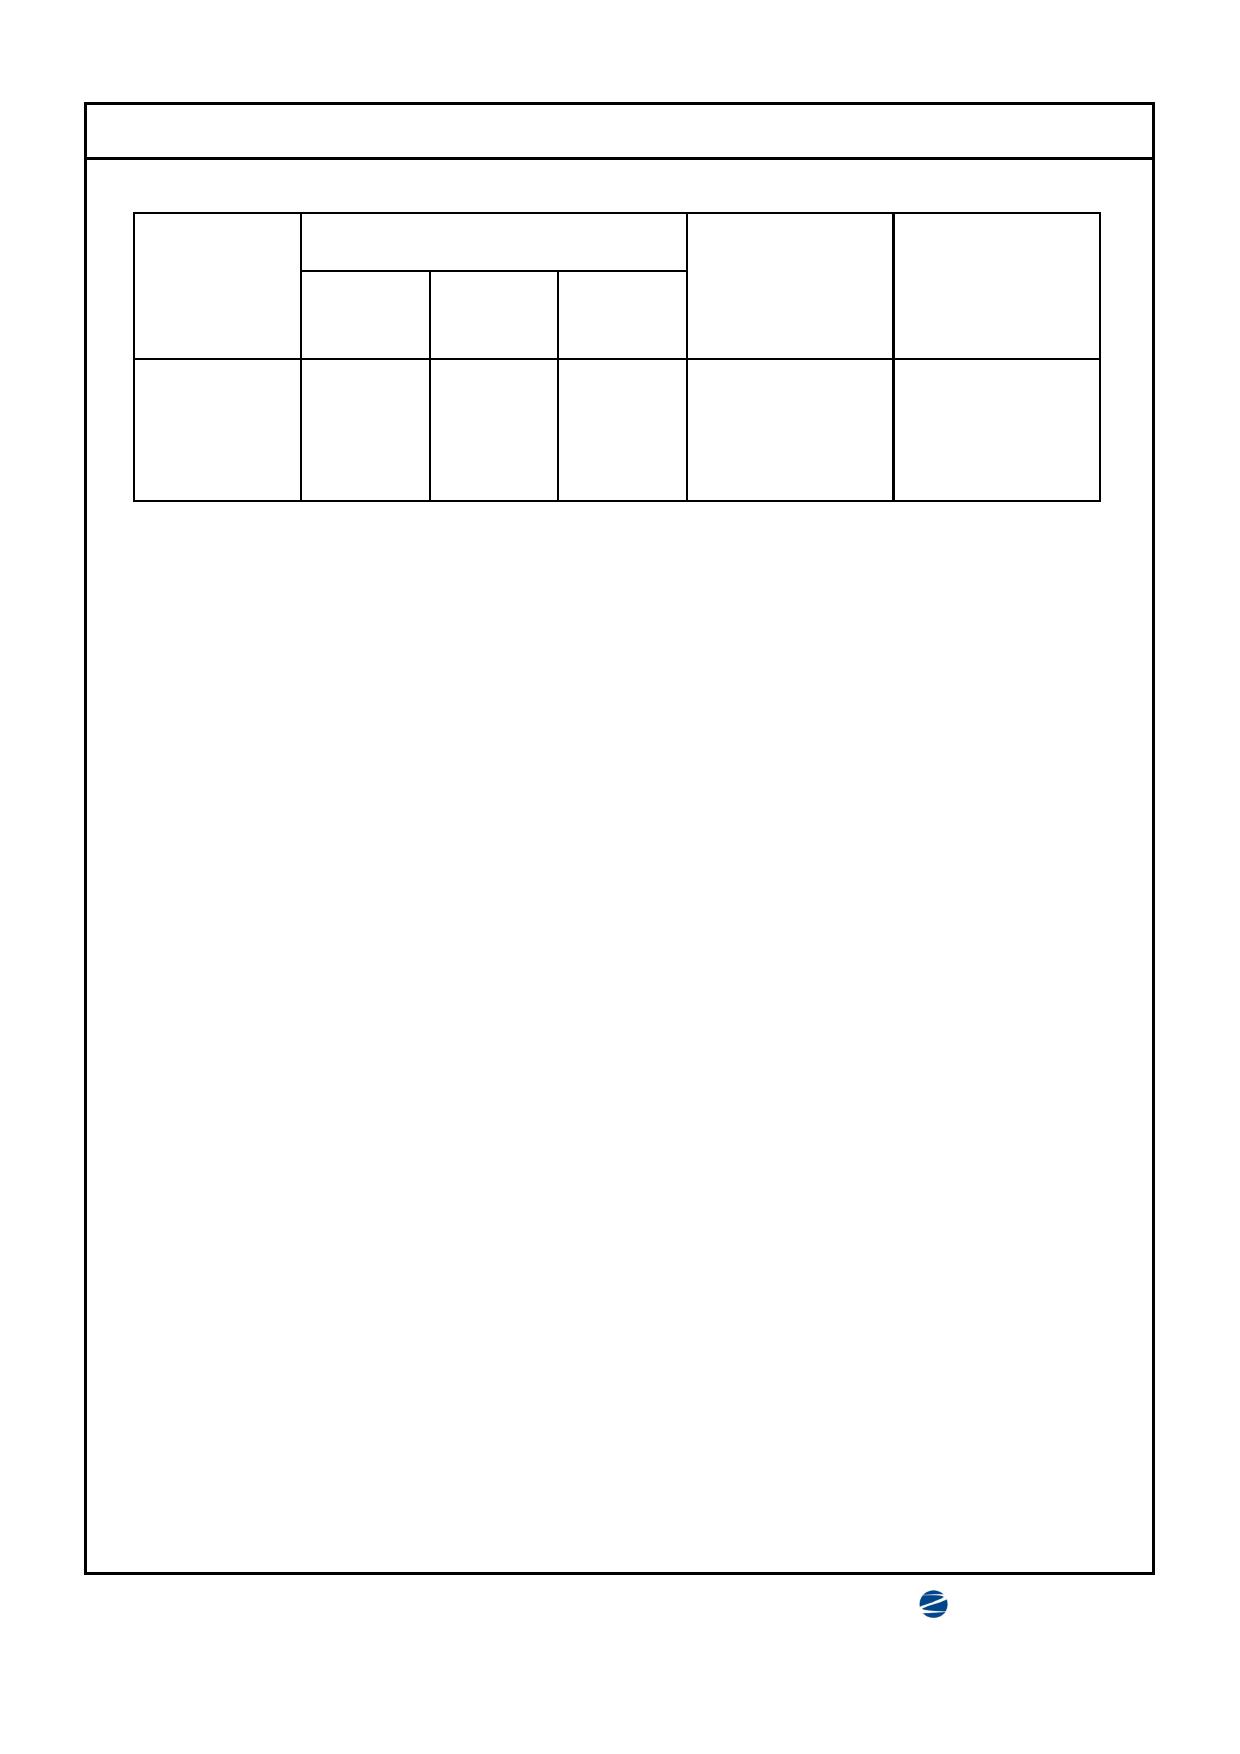 MBR10150CFSH pdf, ピン配列